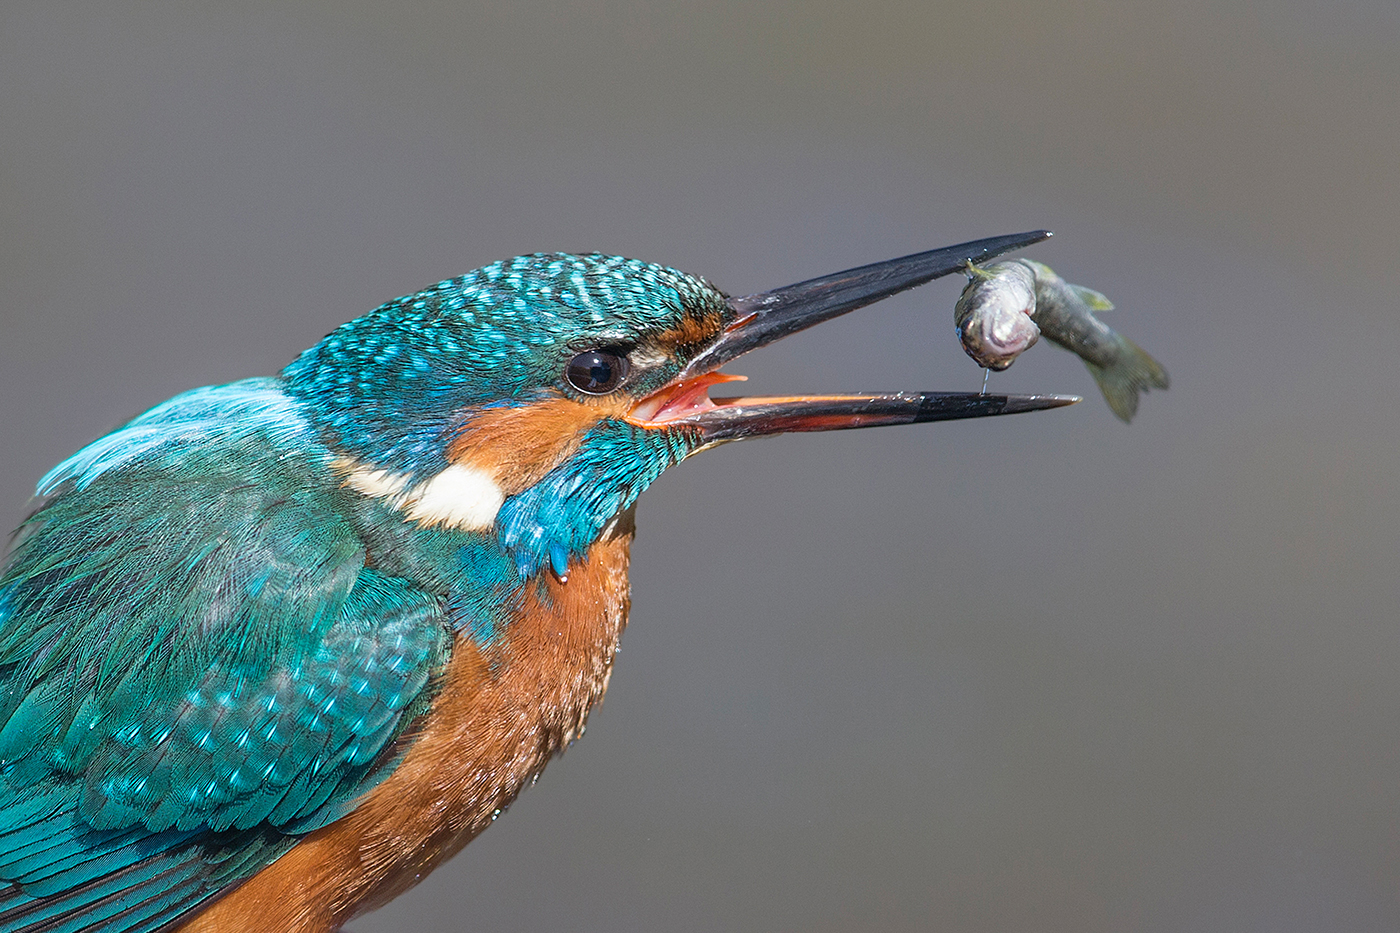 Common Kingfisher, UK